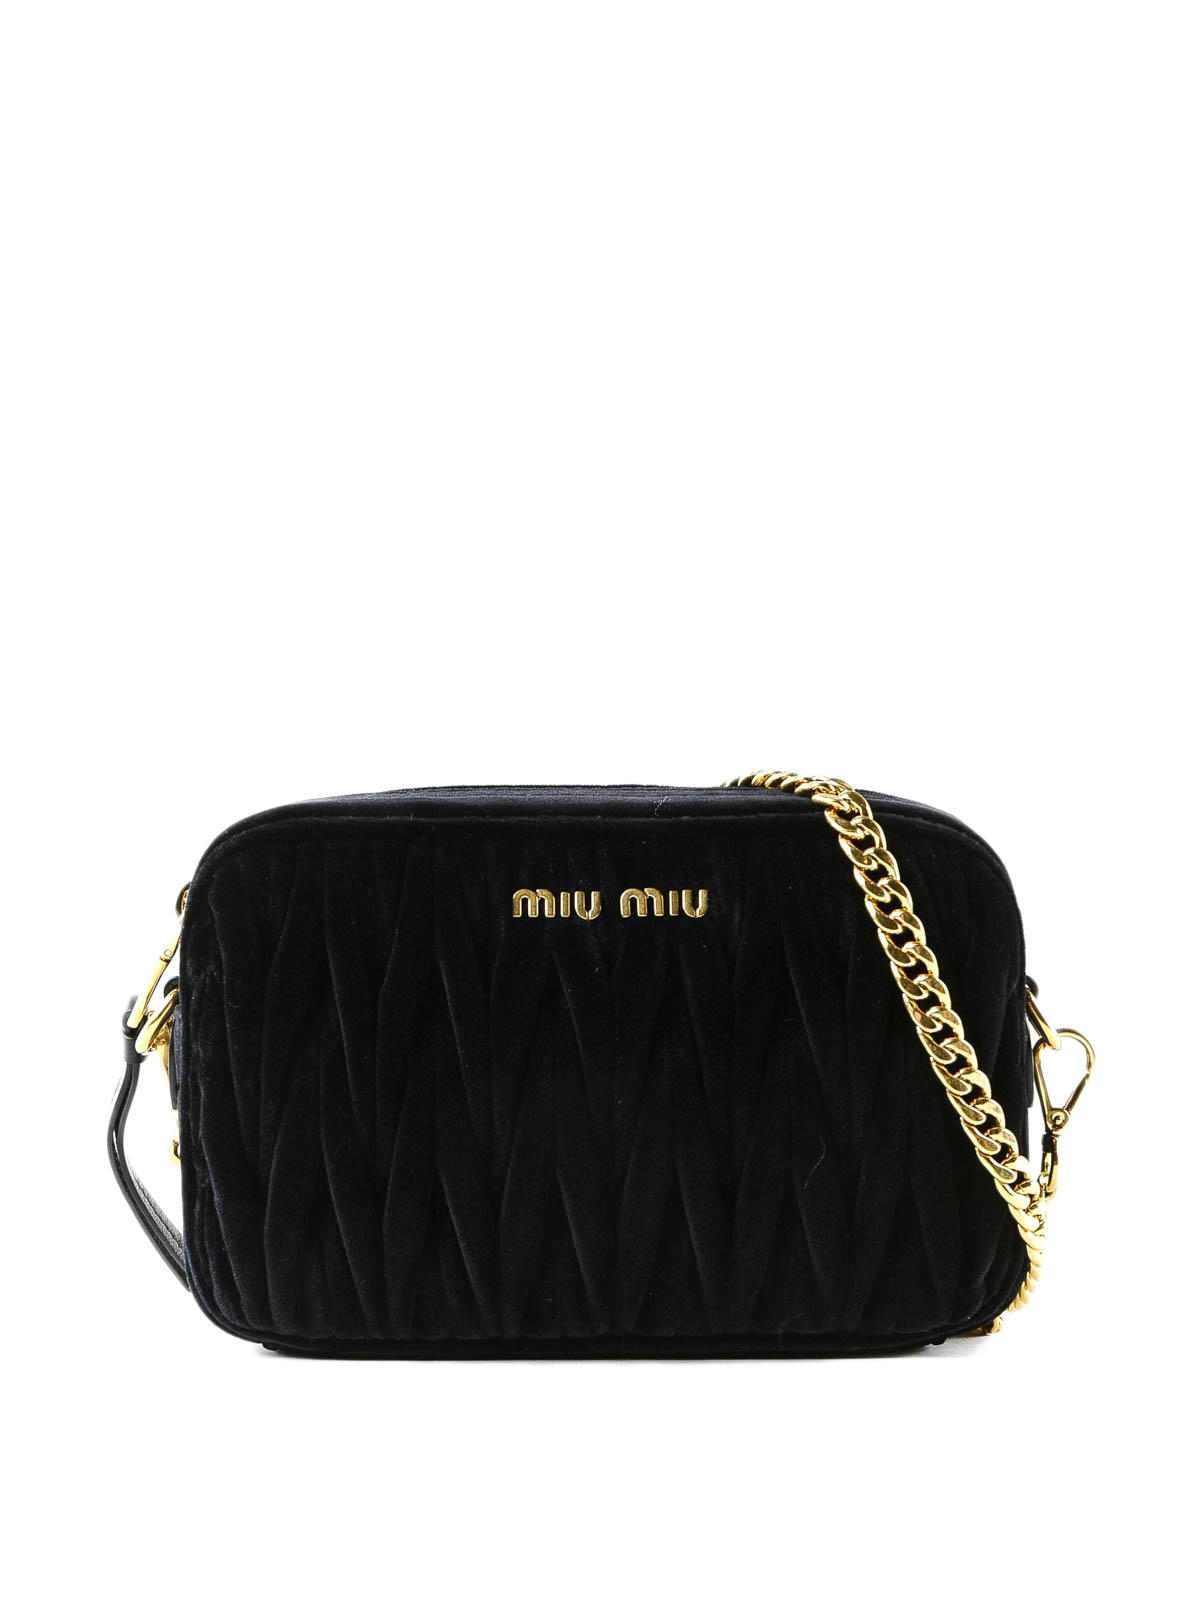 b4fcd37cfd41 Miu Miu - Black matelassé velvet camera bag - cross body bags ...